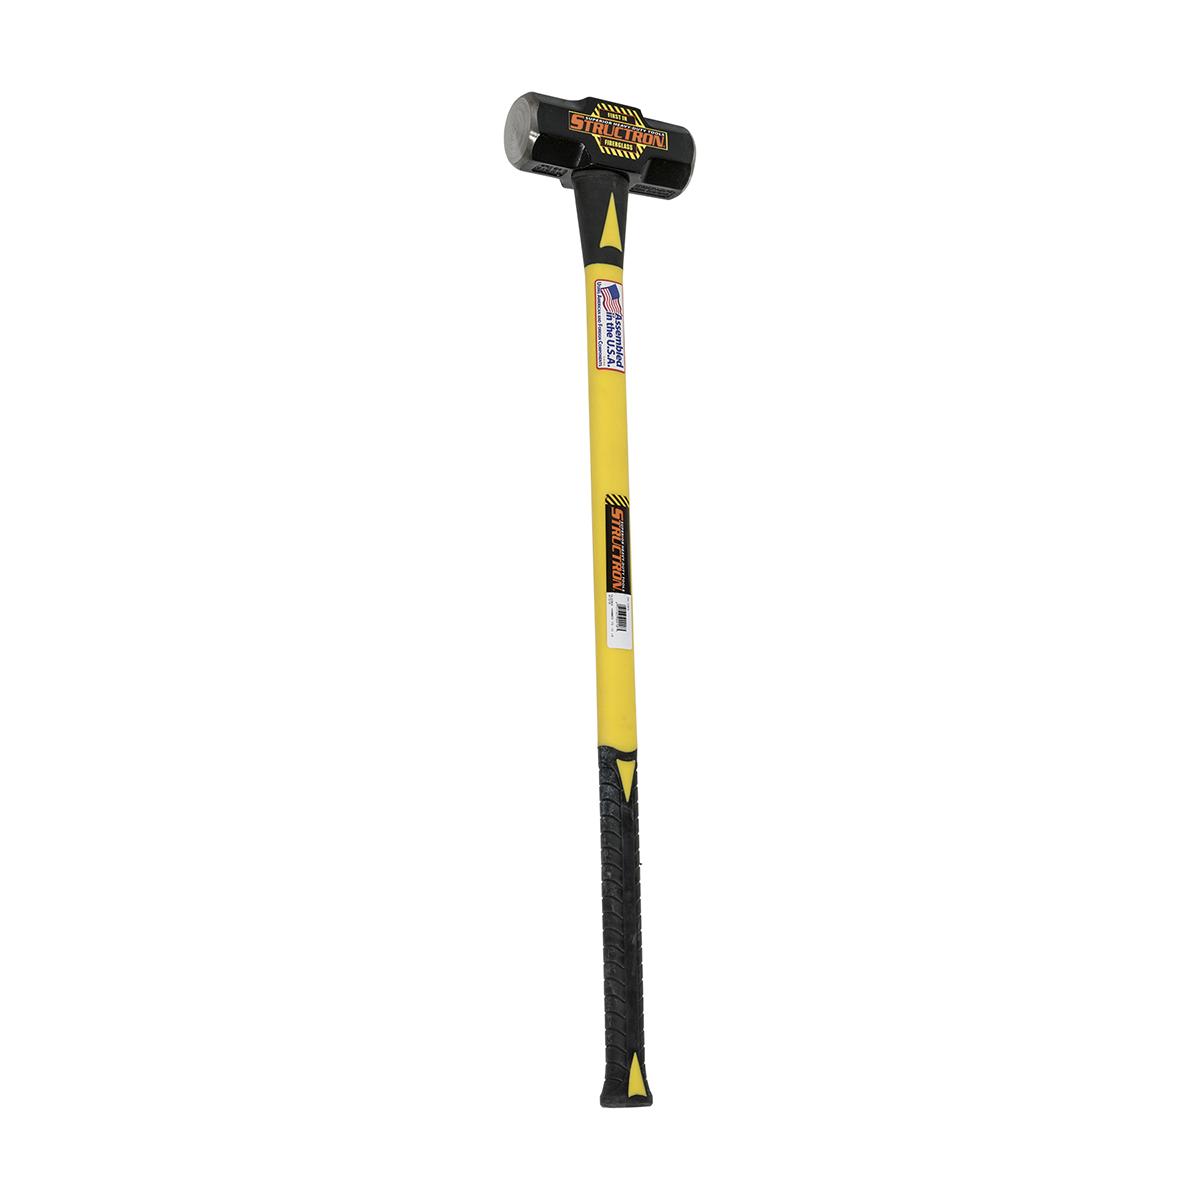 Hammer Axte